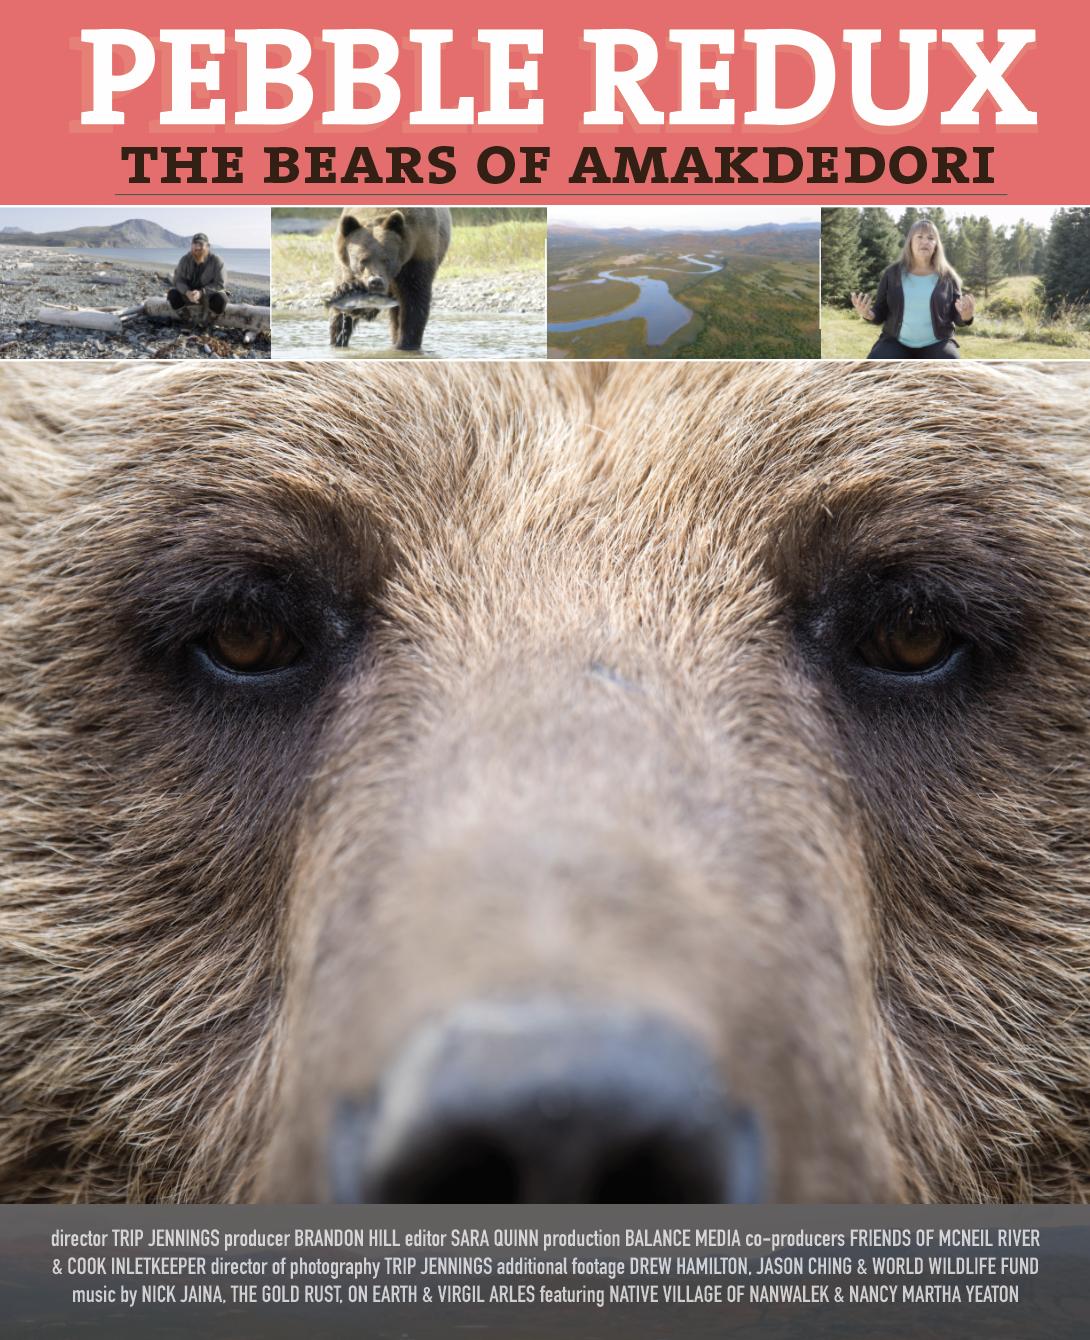 Pebble Redux: The Bears of Amakdedori | Full Film Now Online